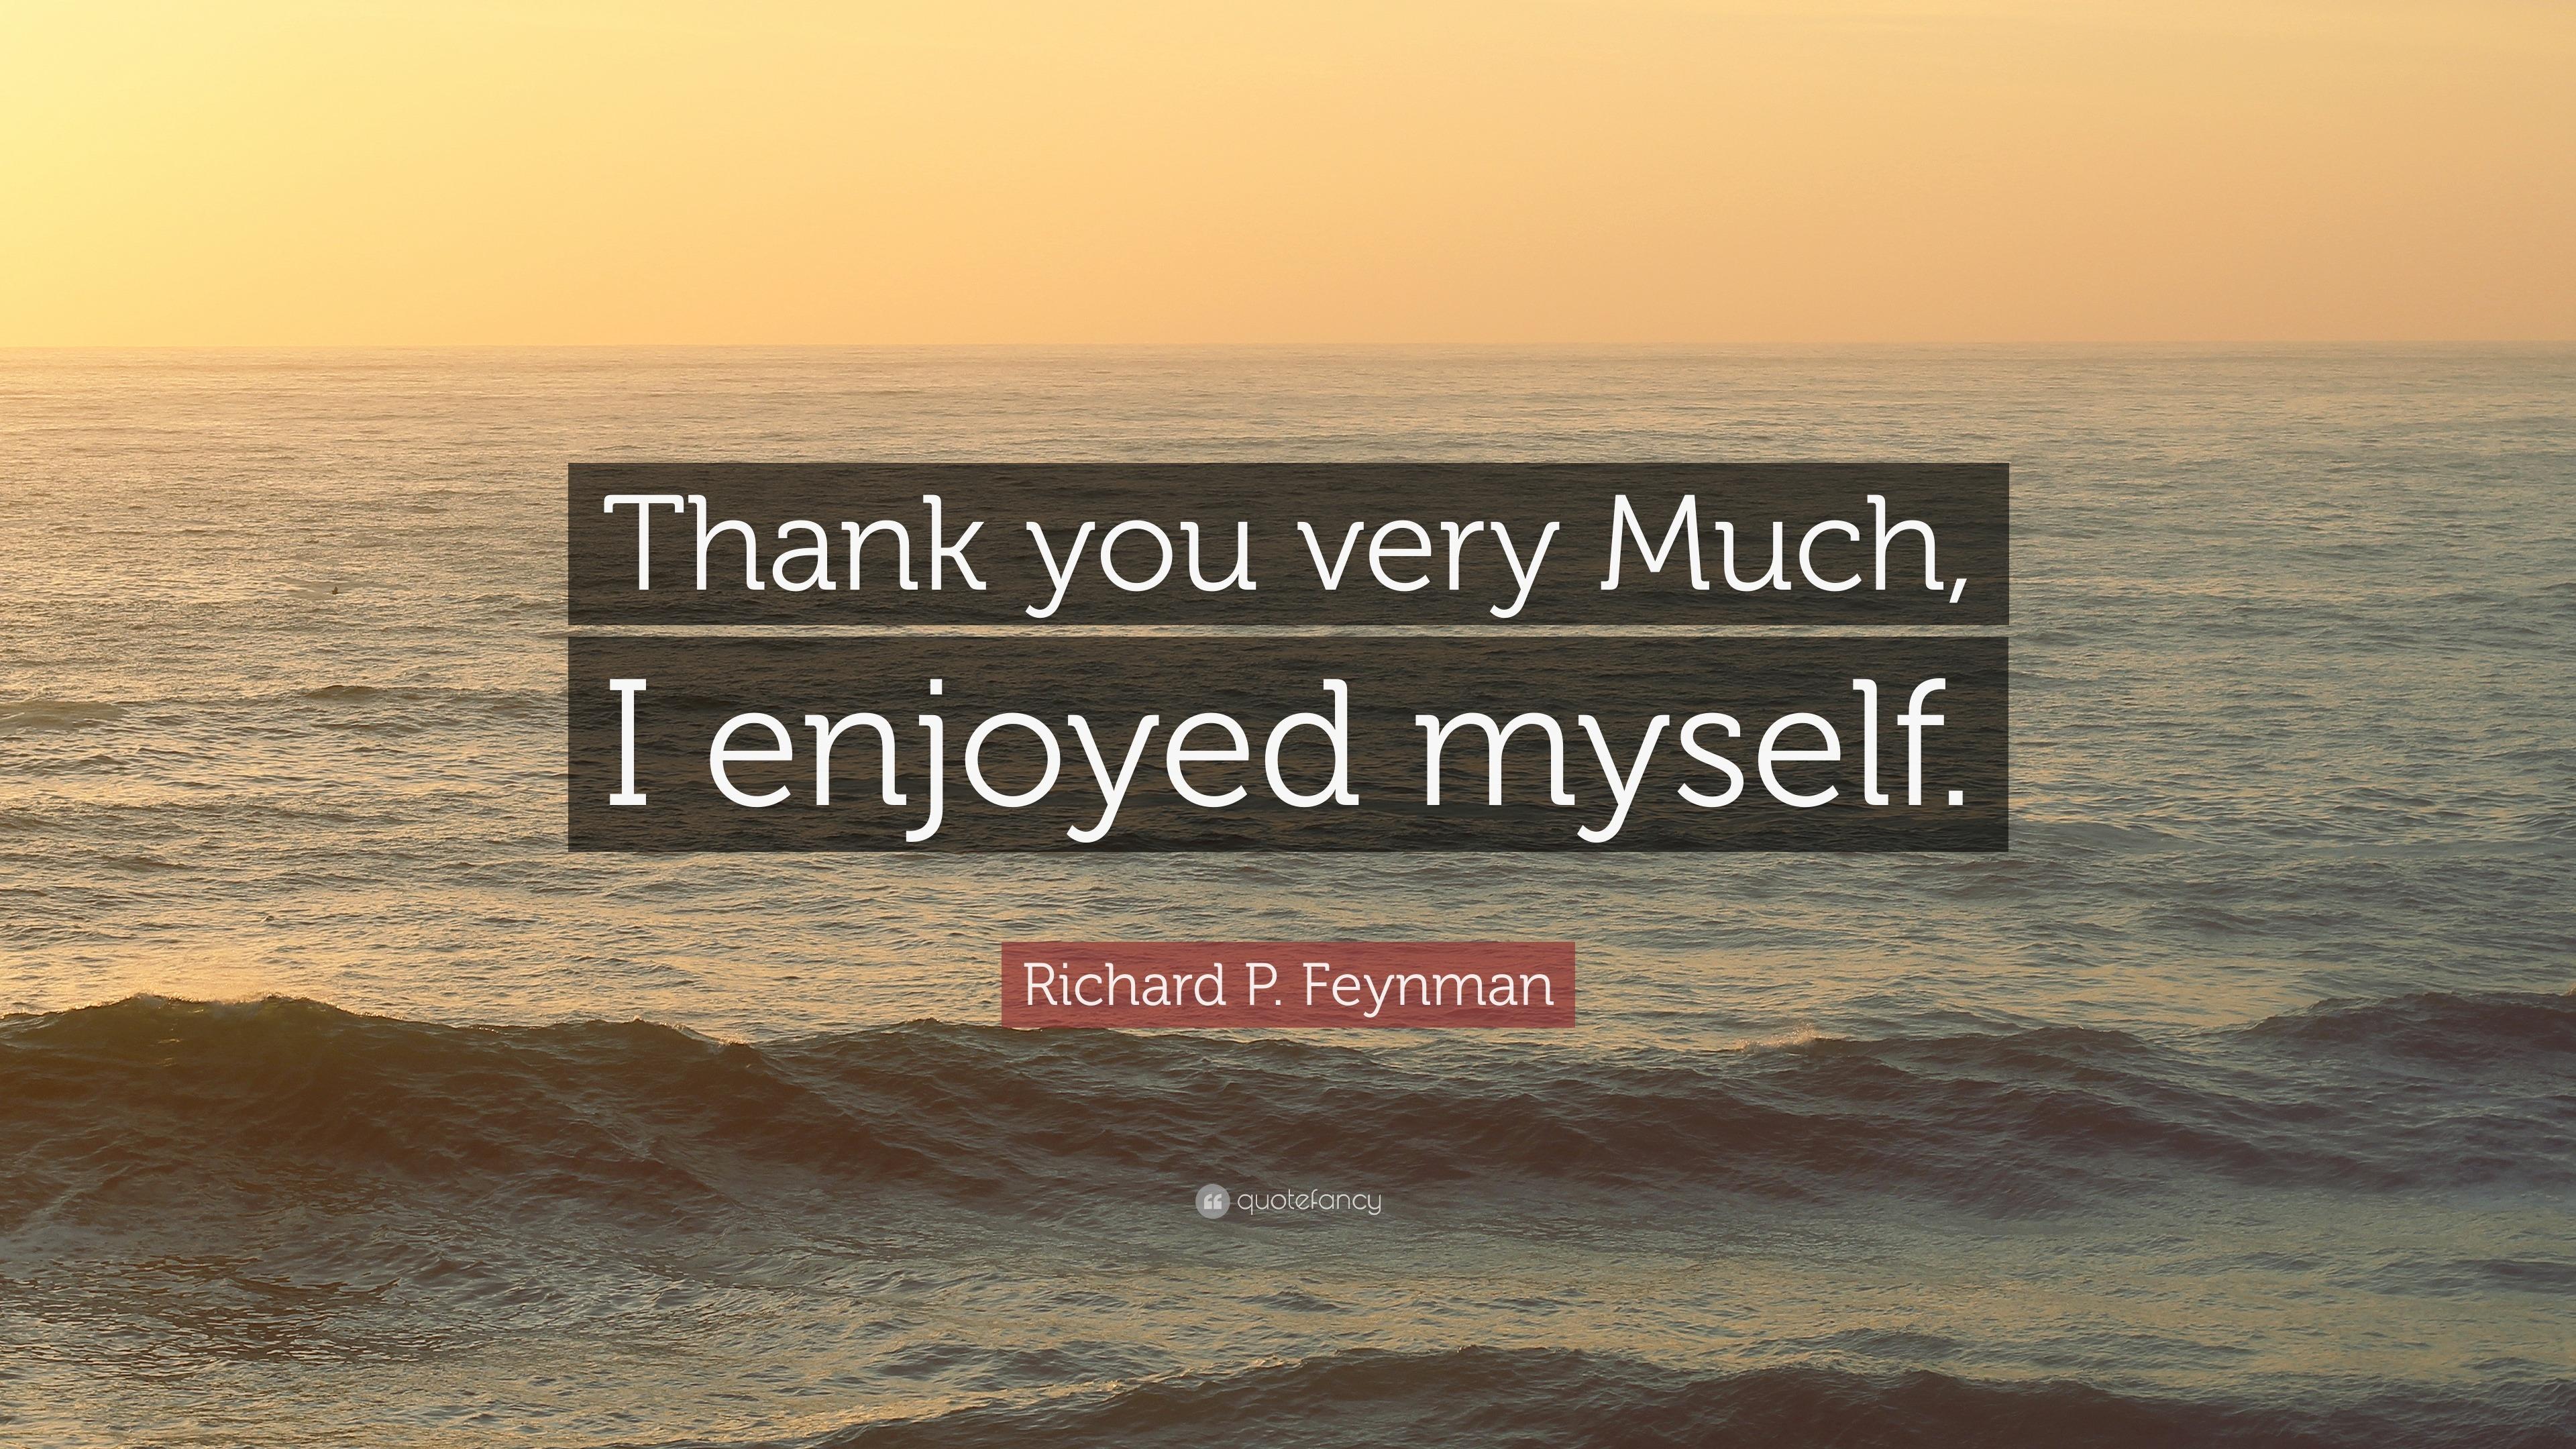 Richard P Feynman Quote Thank You Very Much I Enjoyed